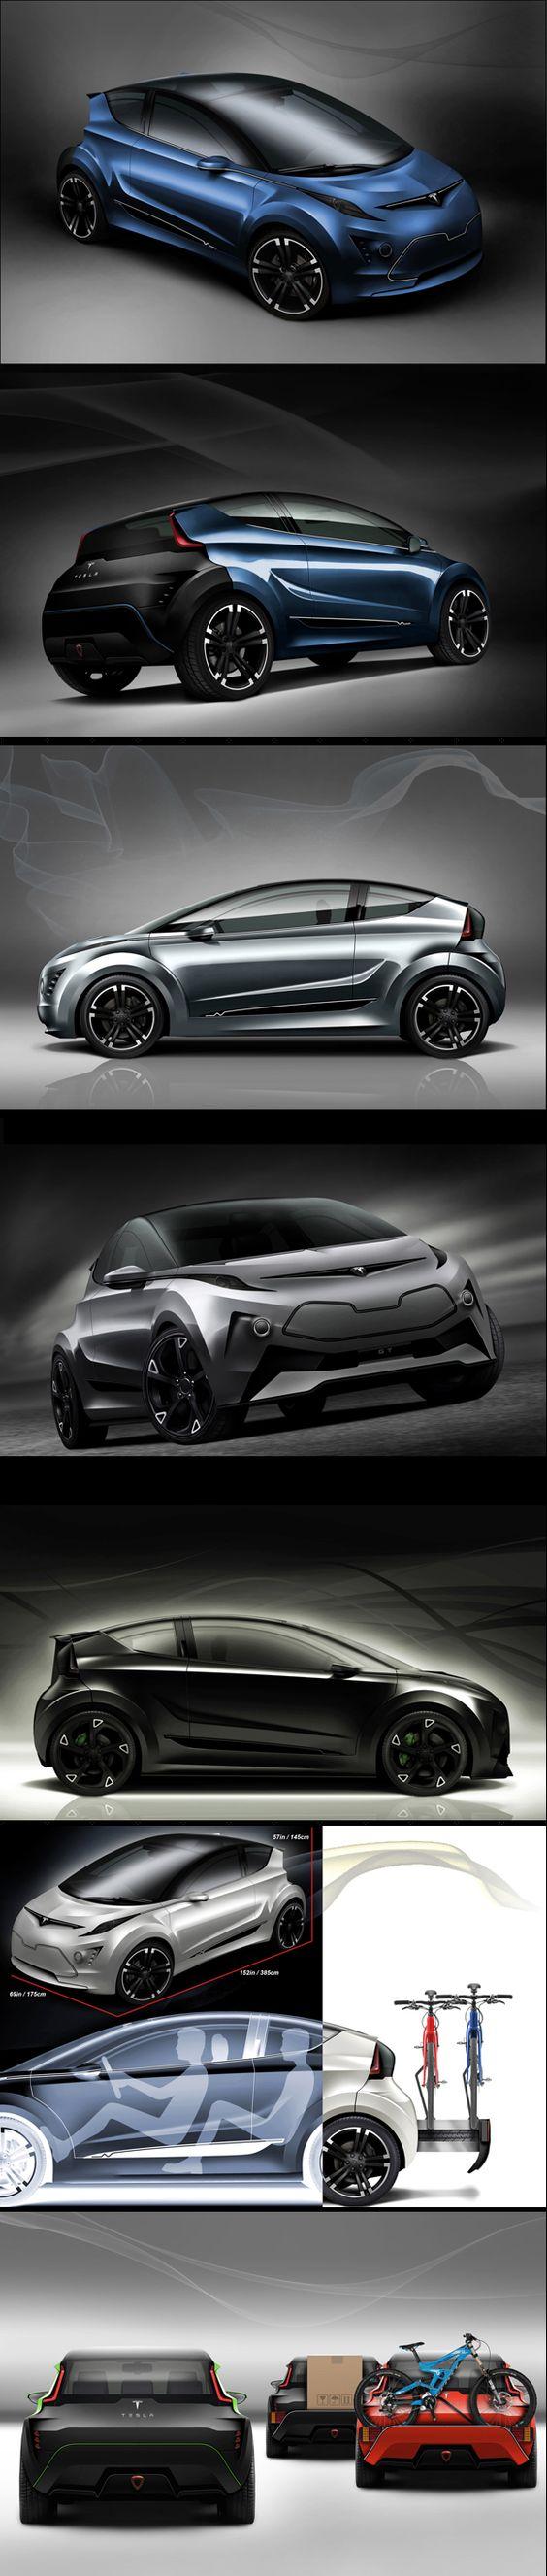 Tesla C, electric-powered city car/hot hatch concept design https ...